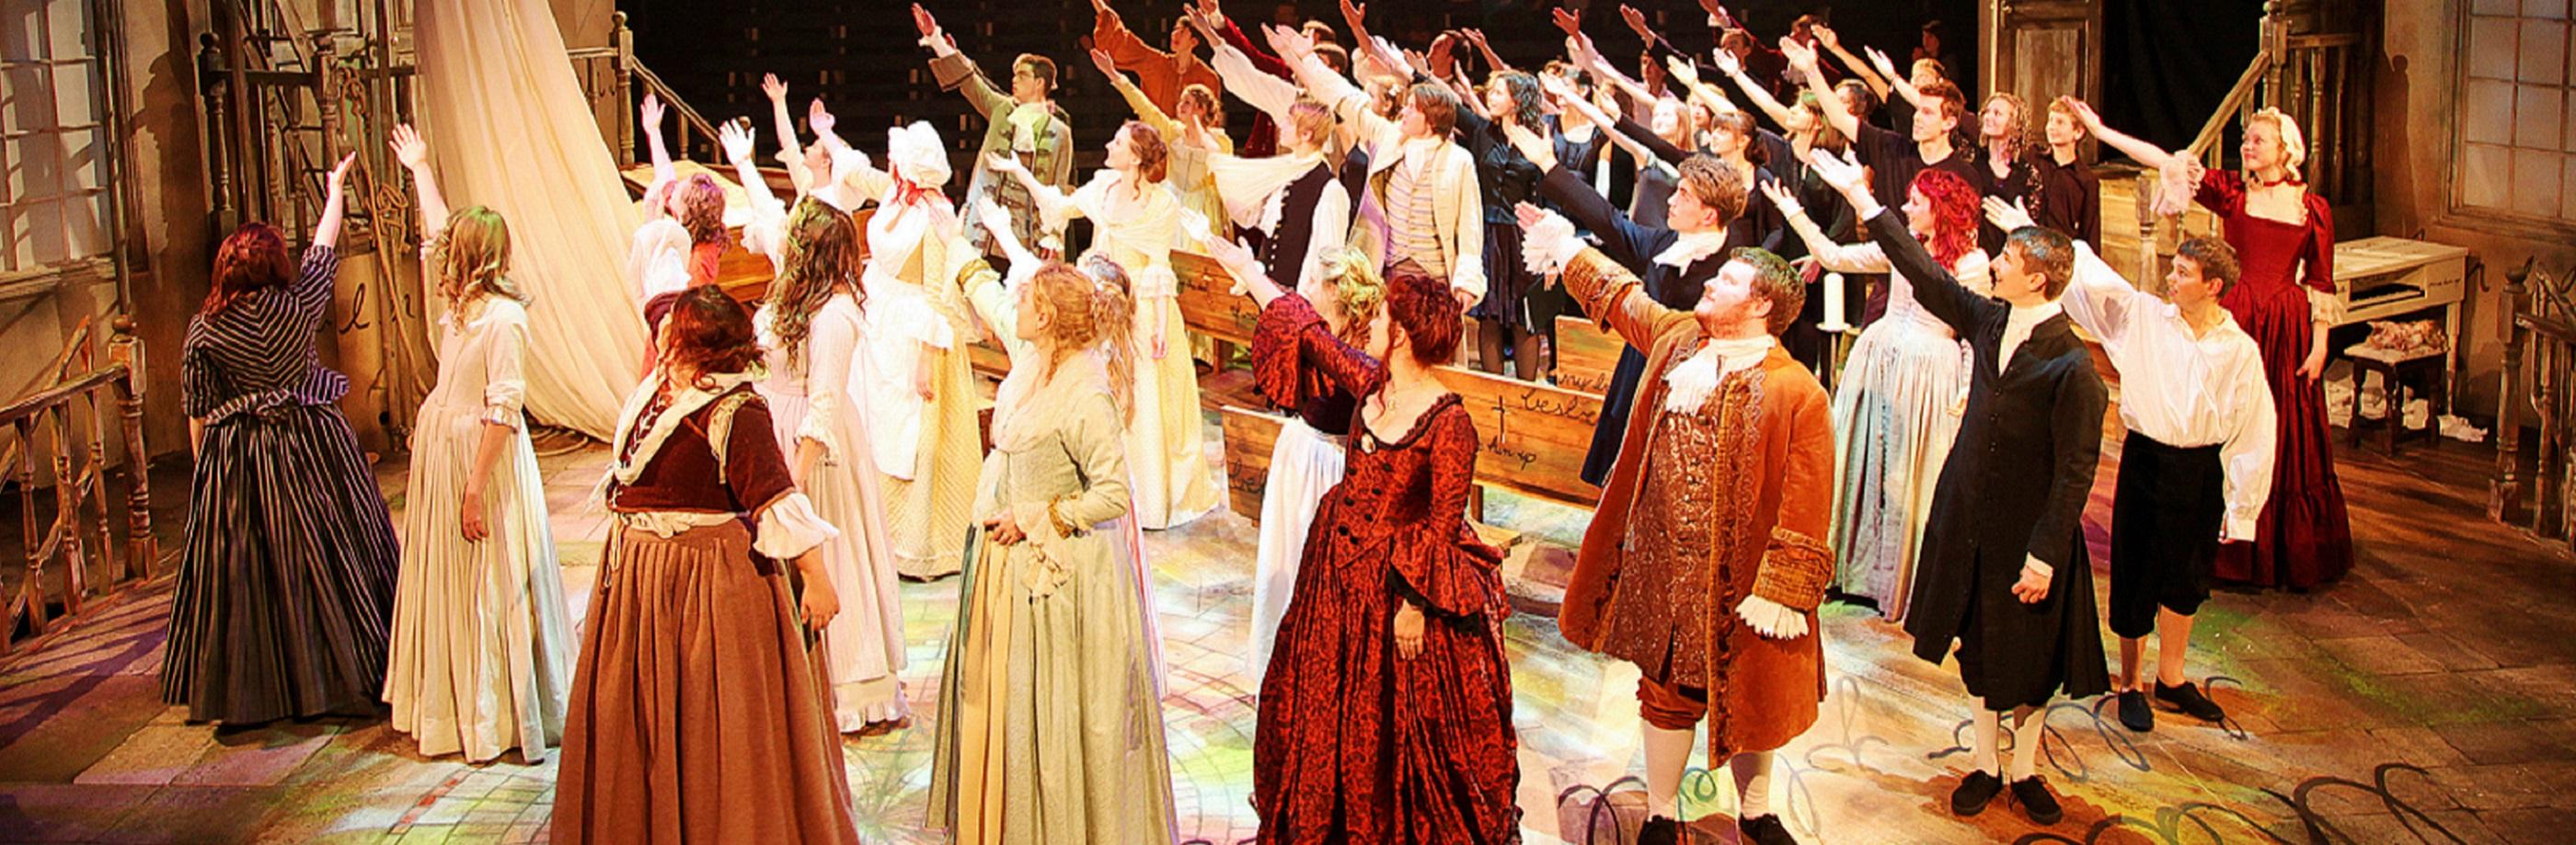 Group of actors in Tudor period dress gesturing upwards